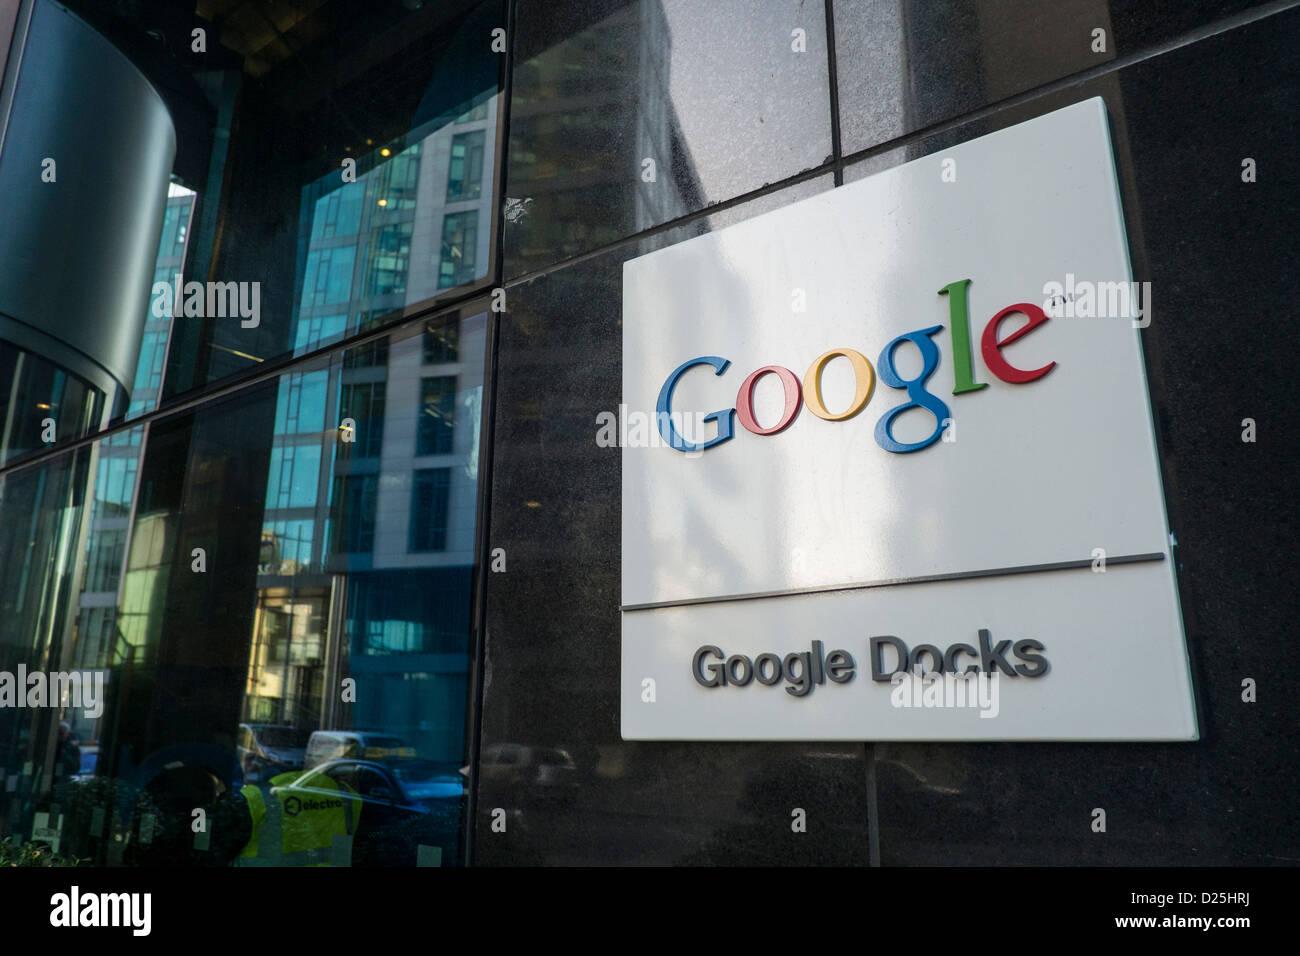 Google Hq Stockfotos & Google Hq Bilder - Alamy